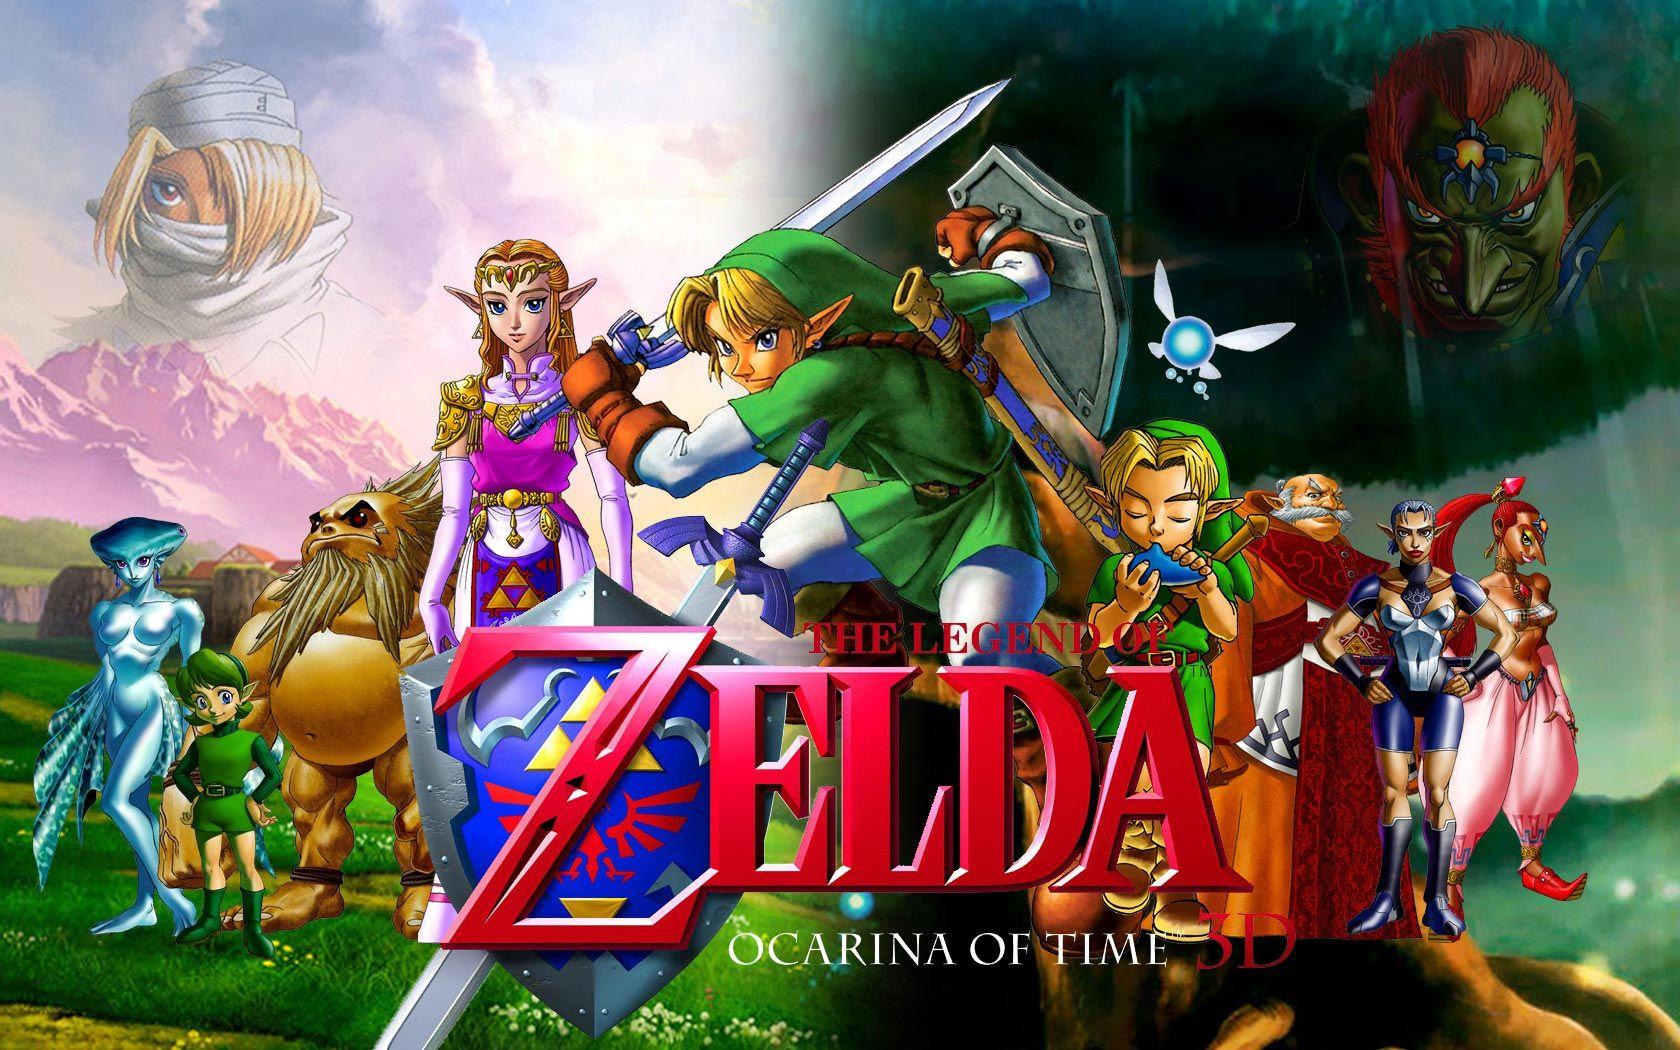 Zelda Wiki La Leyenda De Zelda Pinterest Zelda Juegos Y The